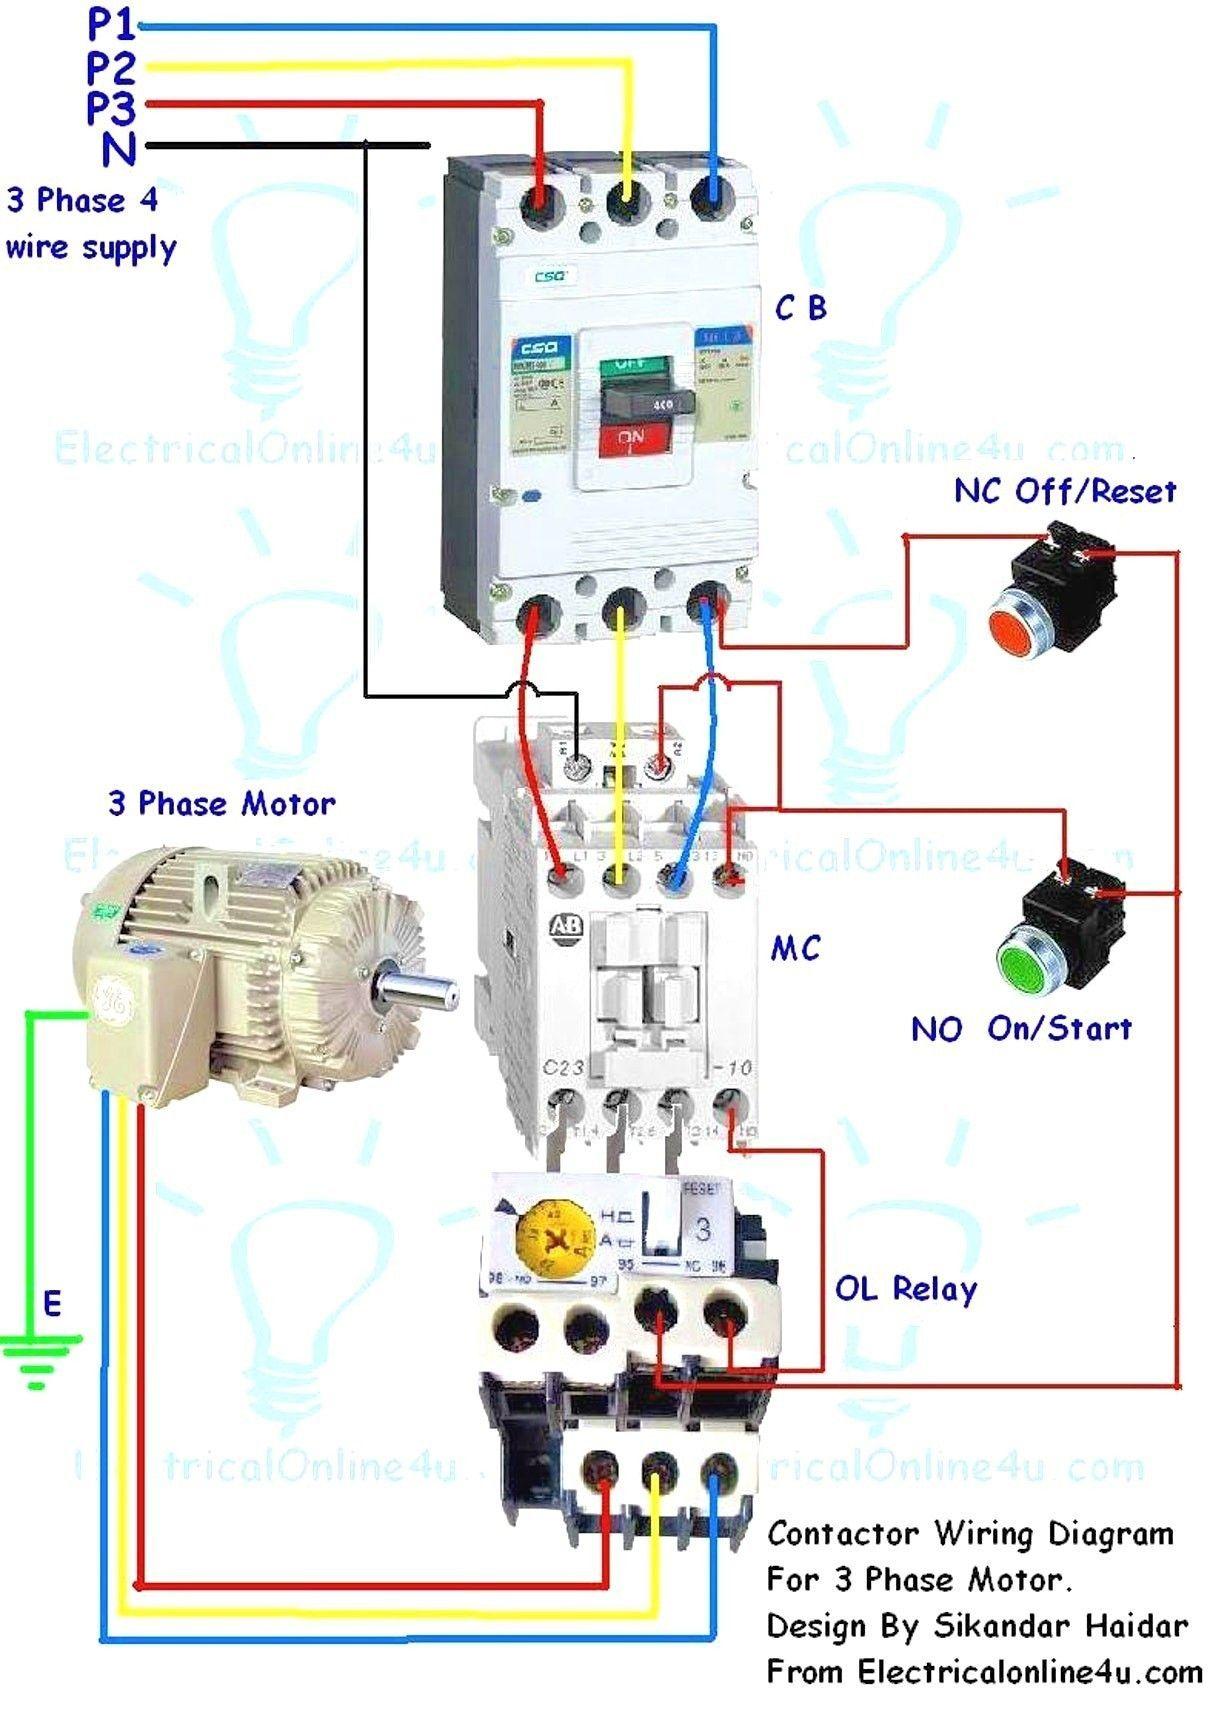 allen bradley relay wiring diagram 3 pole contactor wiring diagram e3 wiring diagram  3 pole contactor wiring diagram e3